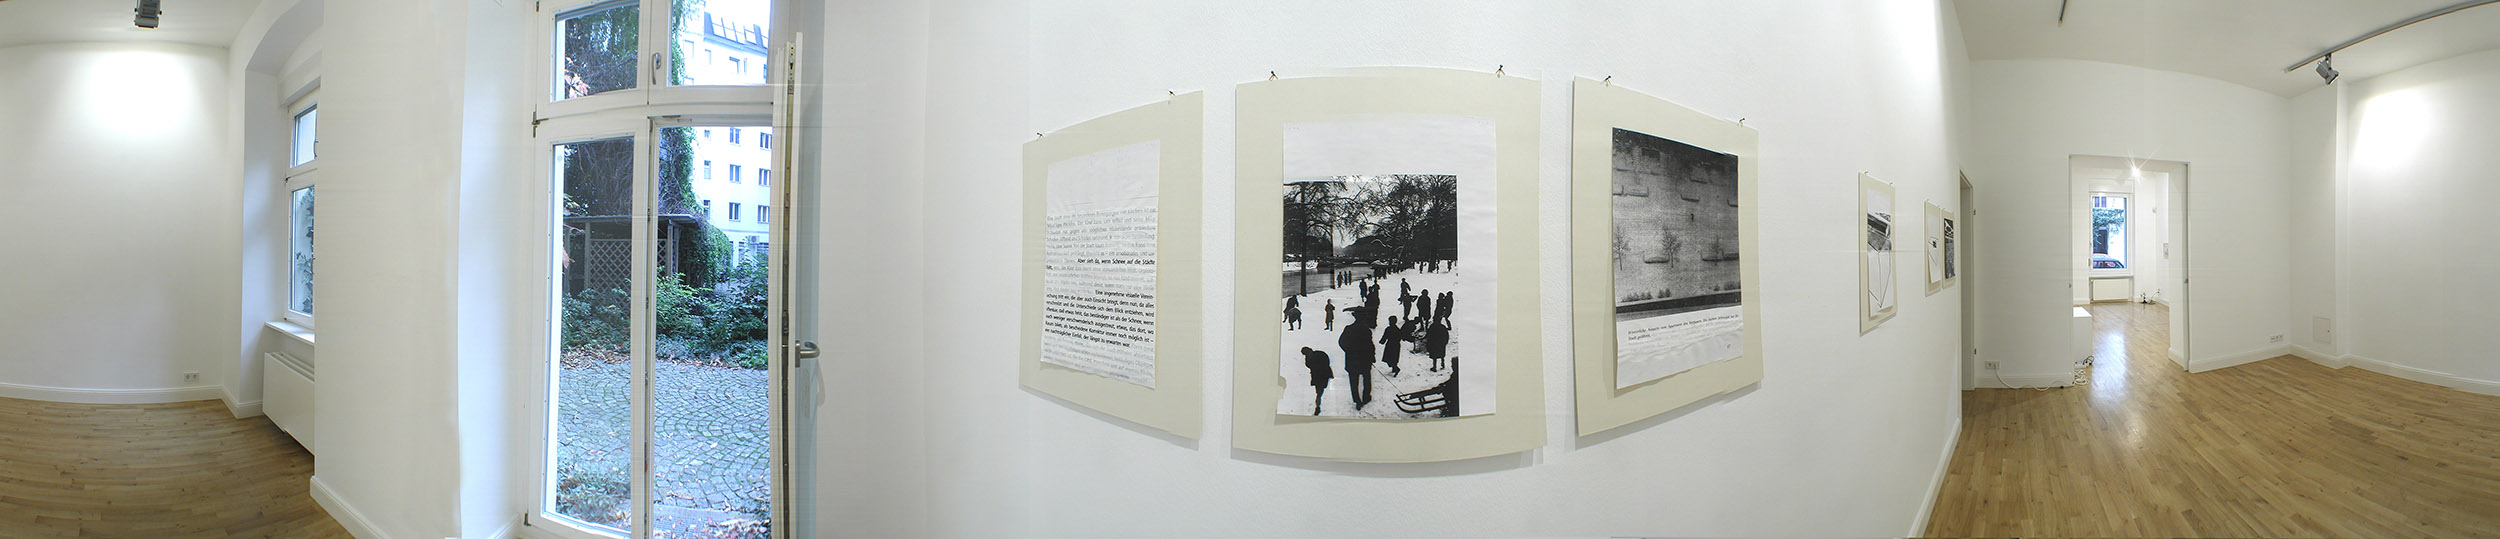 Kienzle 11.jpg